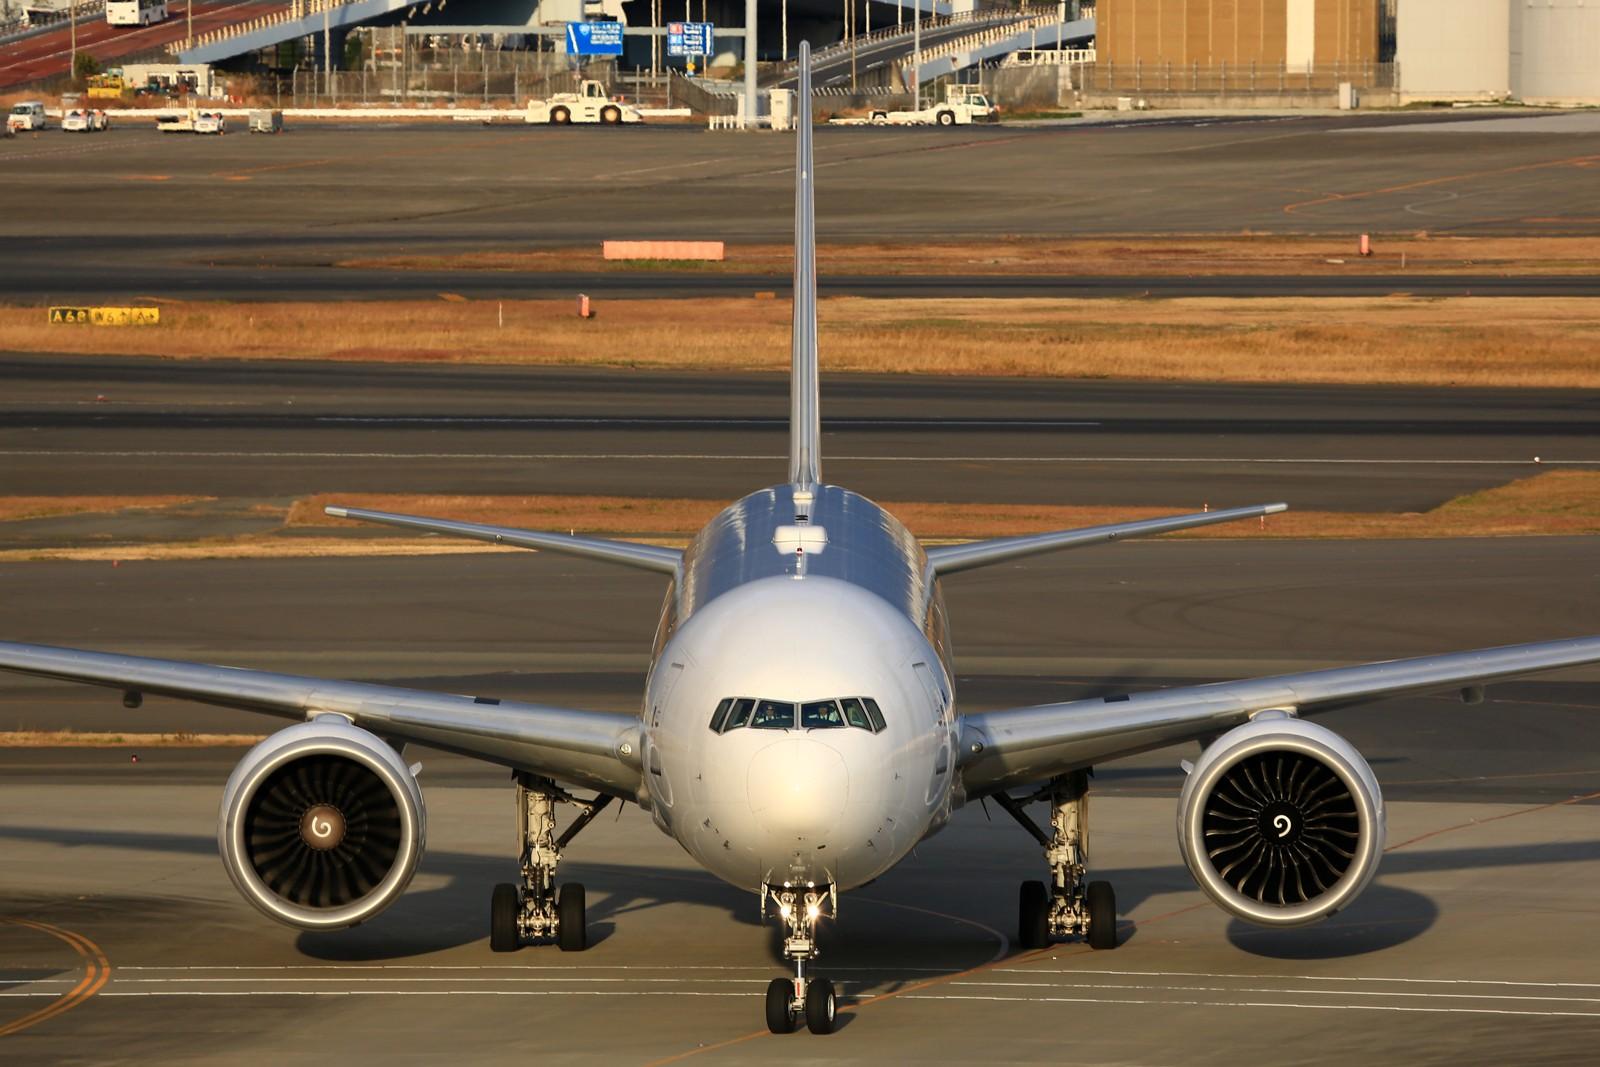 Re:[原创]【HND】******2016新年好,流窜羽田机场:全日空星战,汉莎1500th,以及一些大路货****** BOEING 777-300ER JA731J 日本东京羽田国际机场